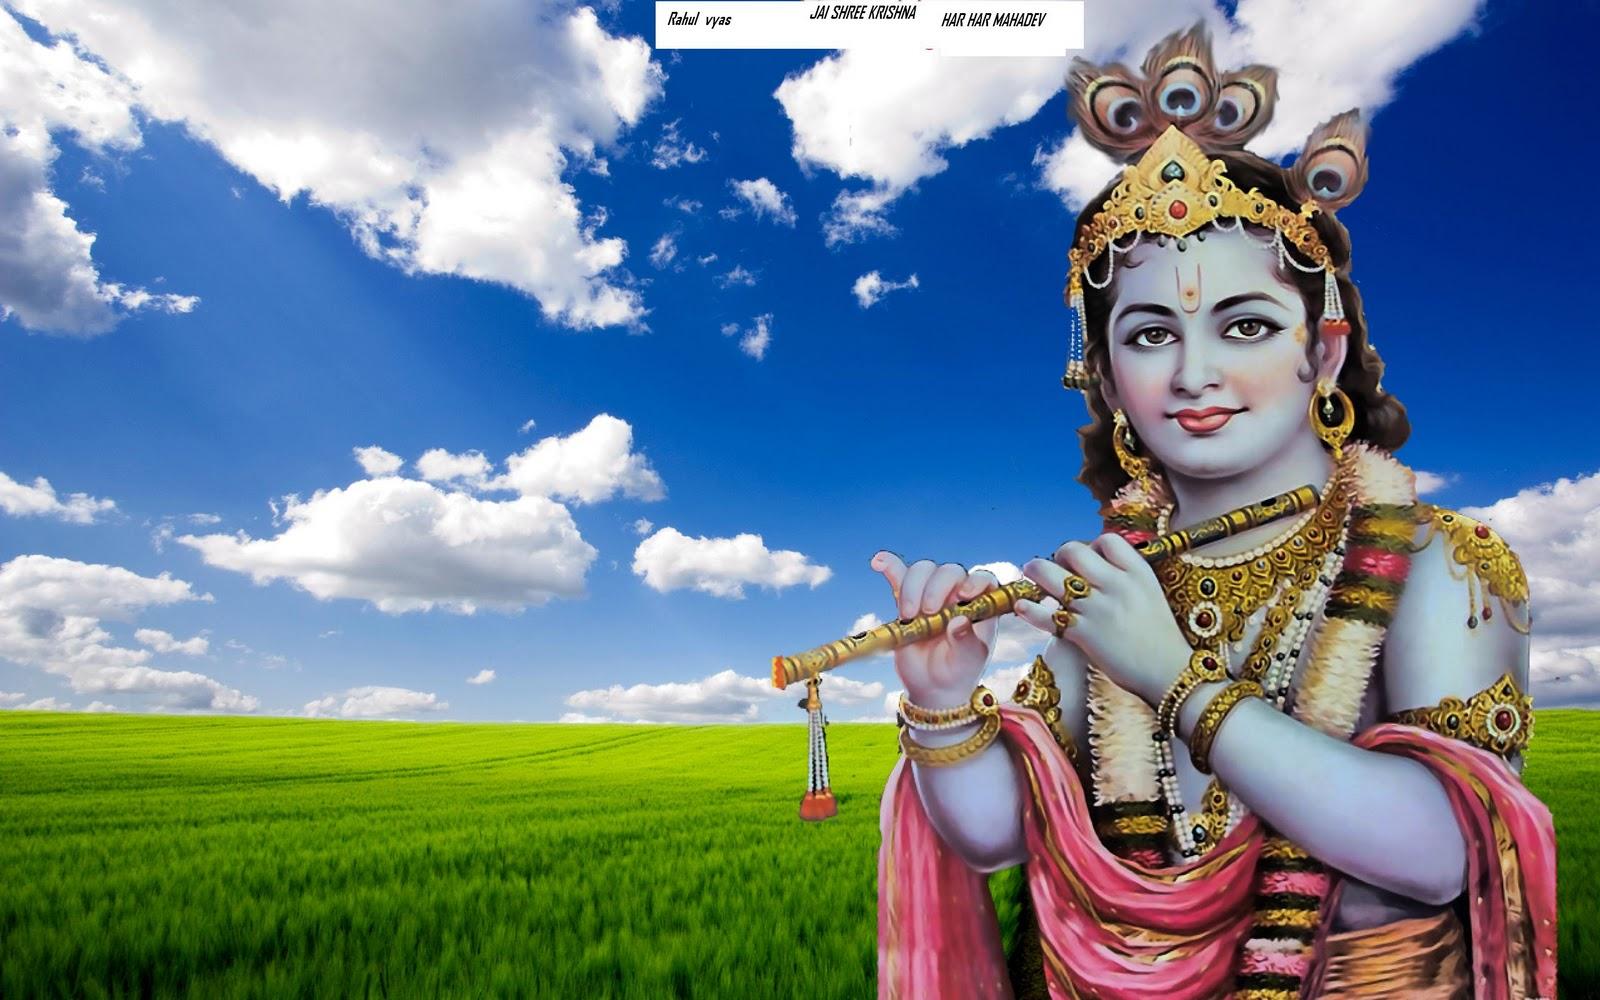 http://2.bp.blogspot.com/_9HxOPYbTgTc/TJ3-2rlMS8I/AAAAAAAAAAQ/EMxOEORzgRw/s1600/Krishna_XP_Desktop_Wallpaper_2+copy.jpg